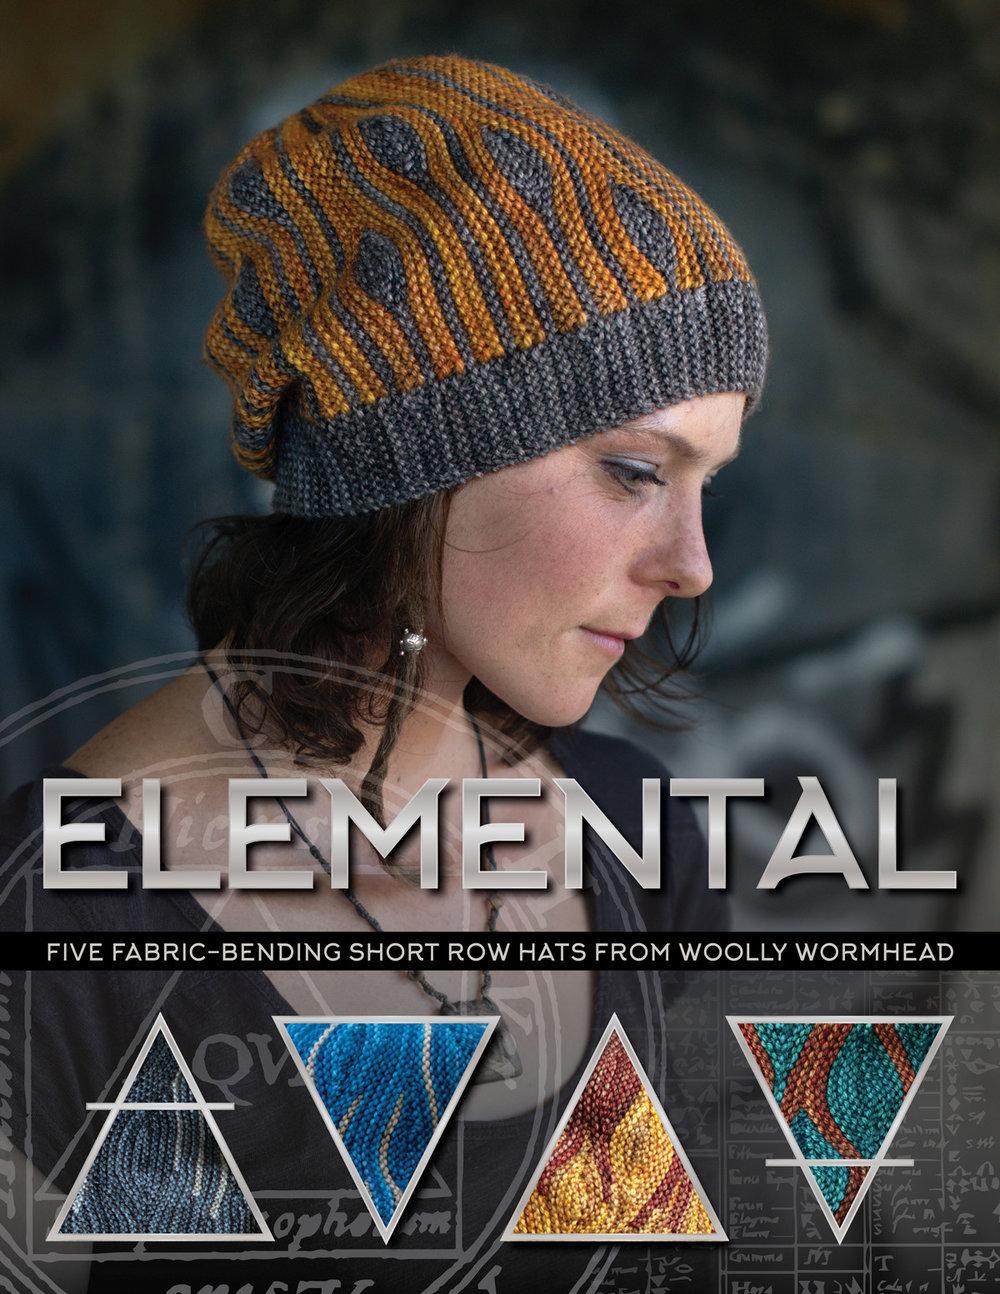 Elemental-Cover-1200-72dpi.jpg